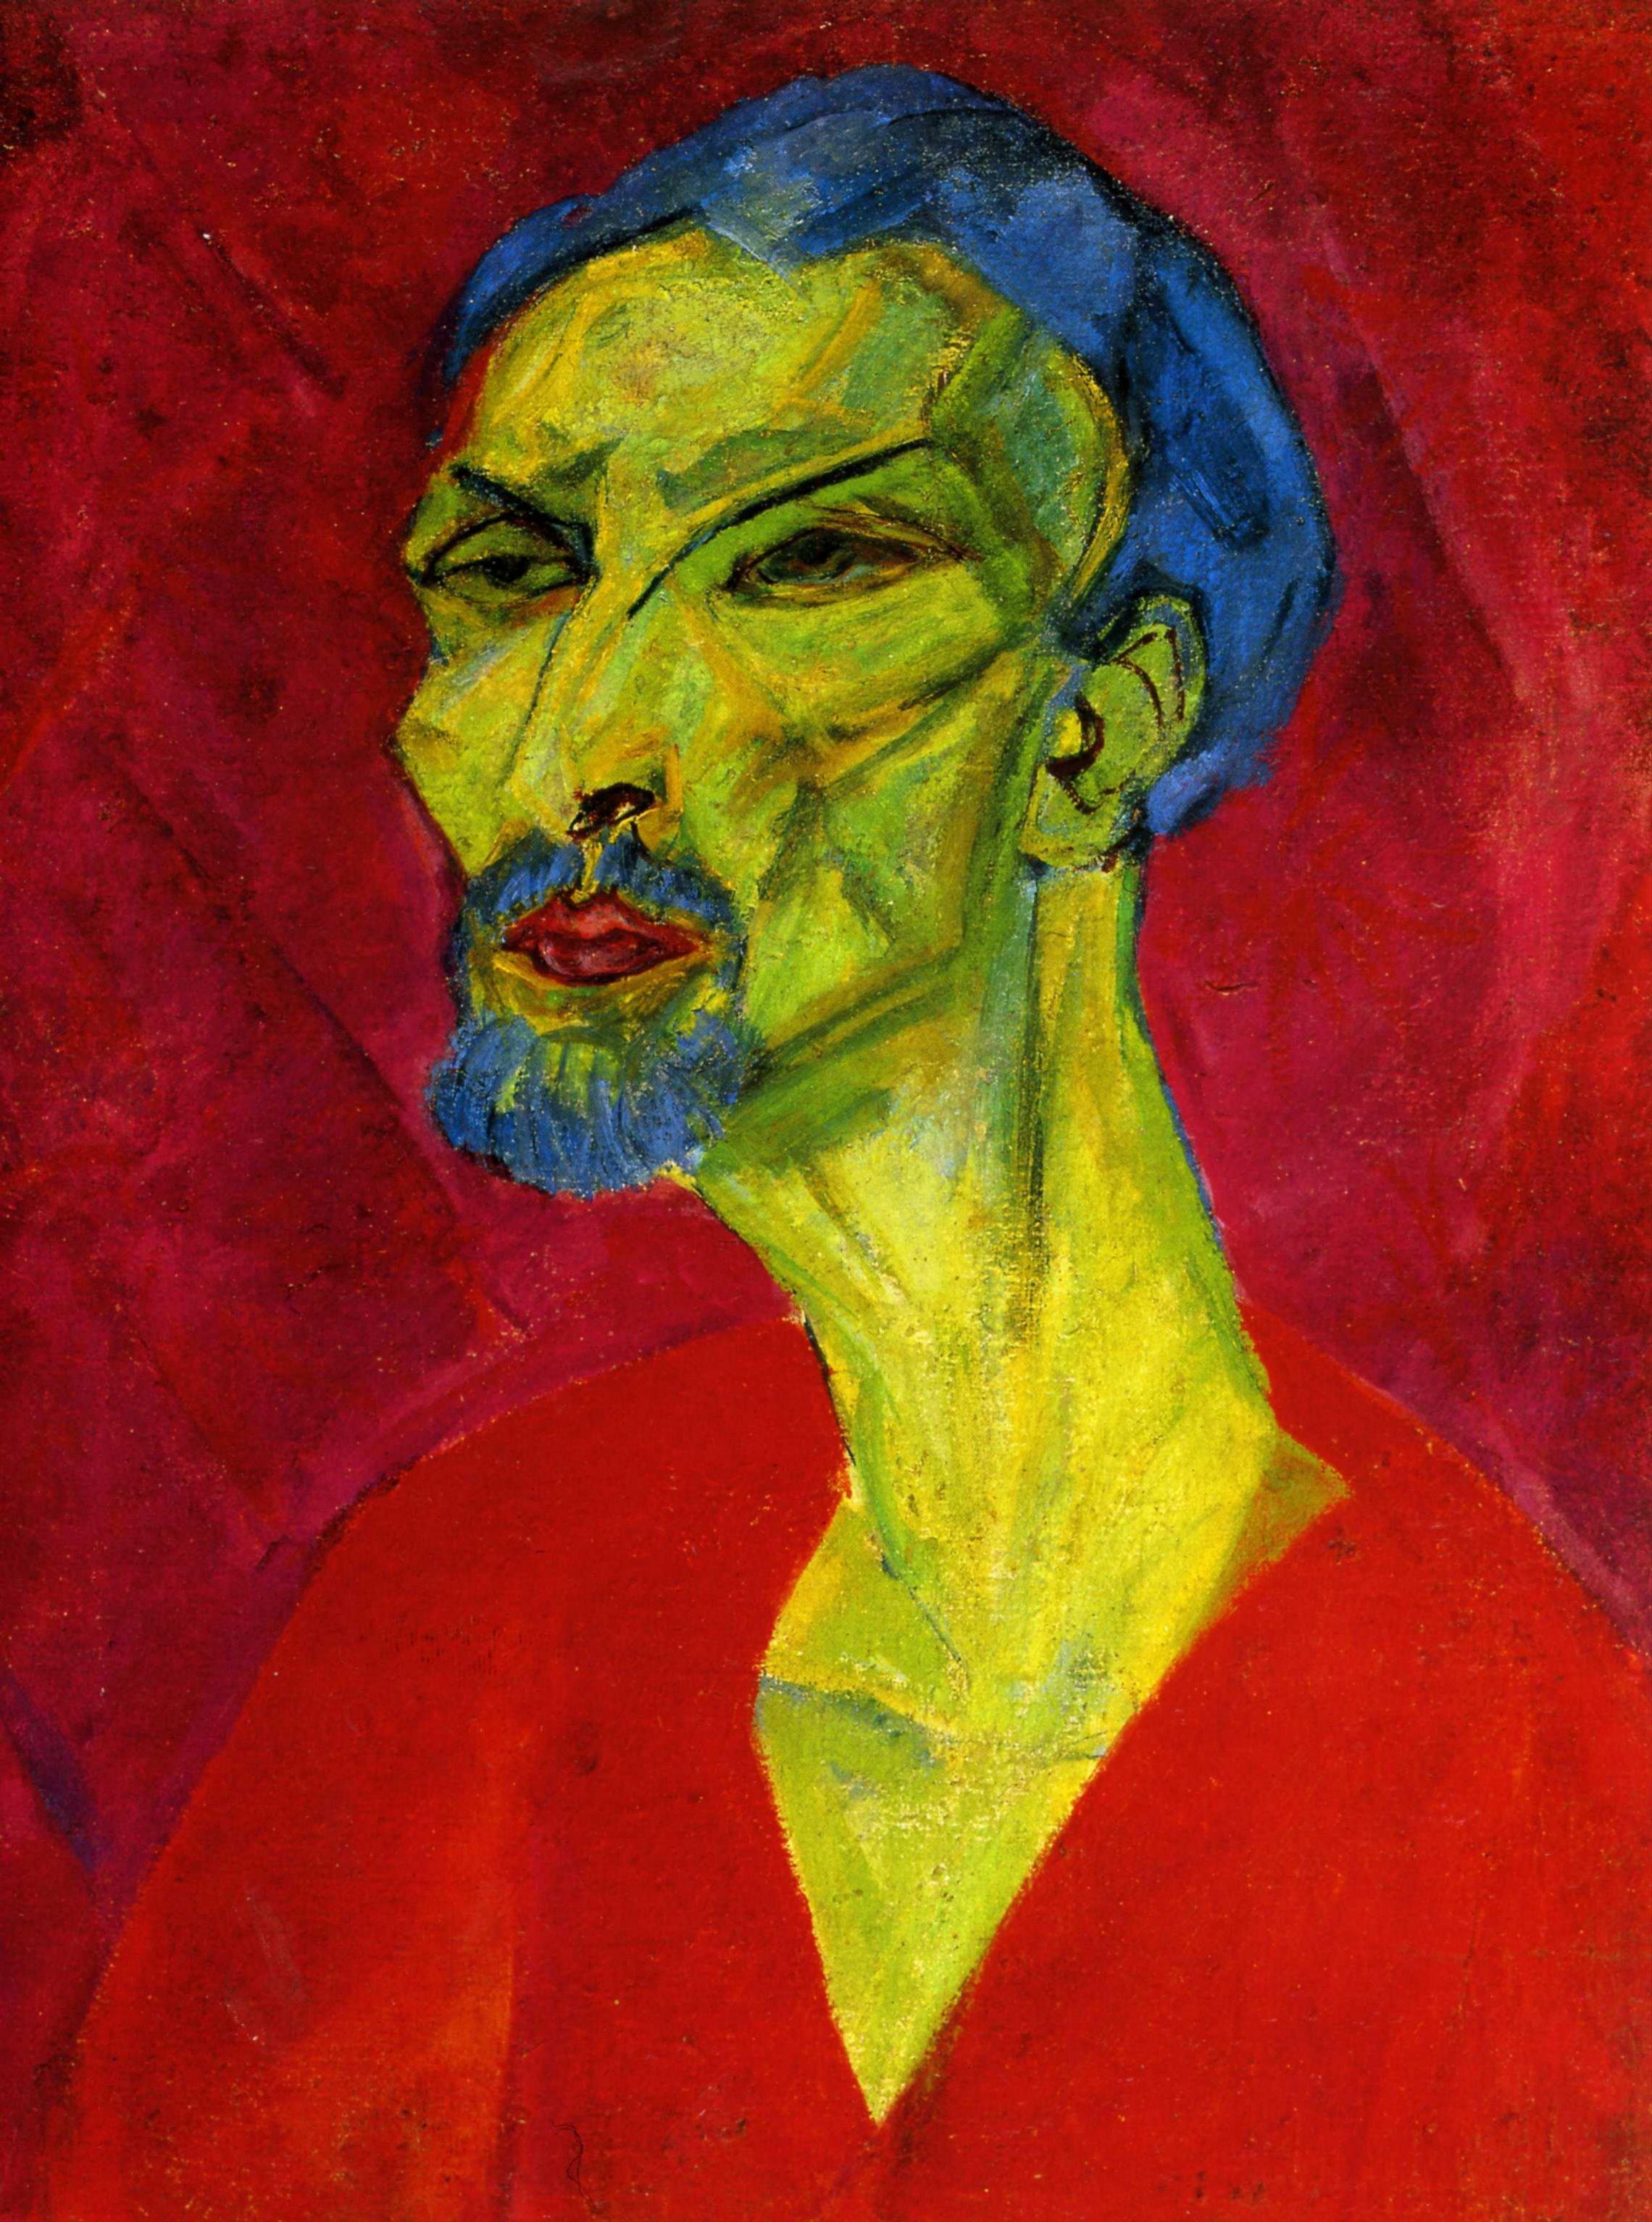 1919 1929 Hanns Katz - Portrait of a Man in red